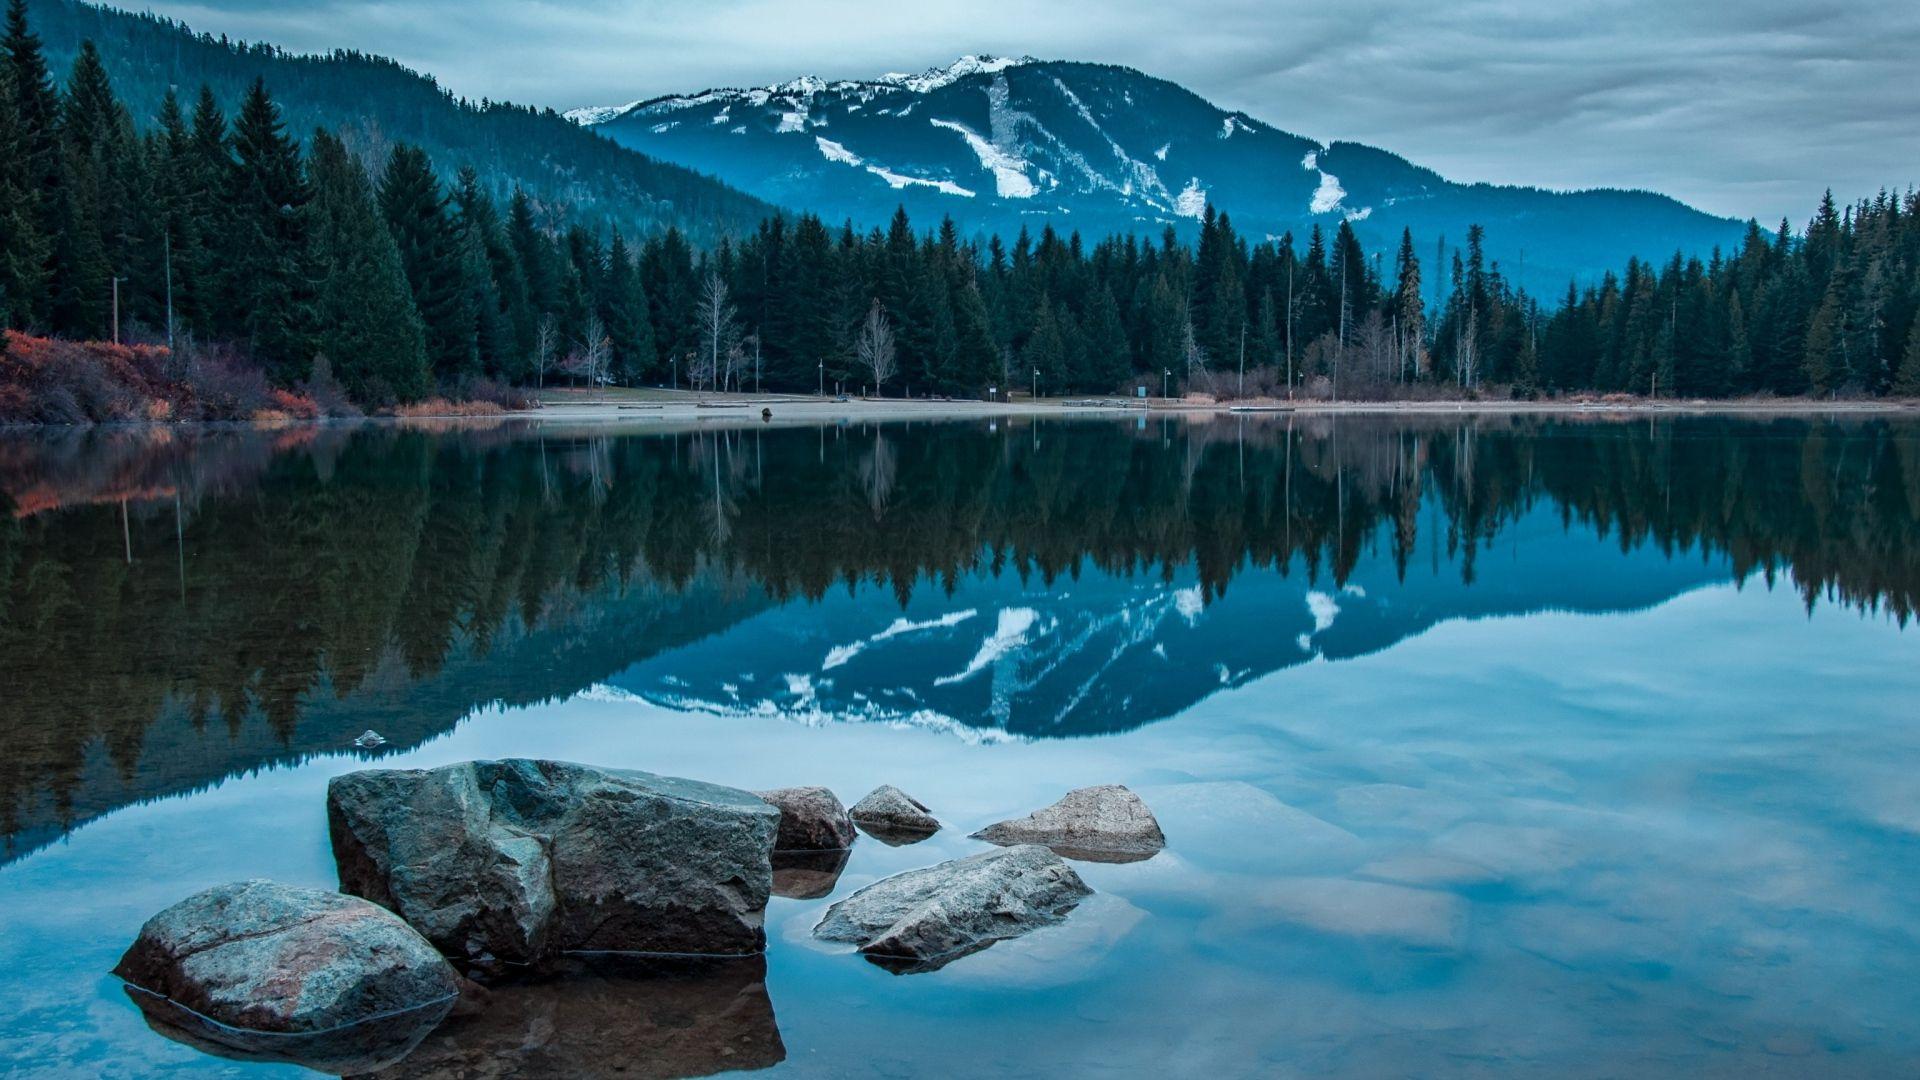 Rocky Mountain desktop image